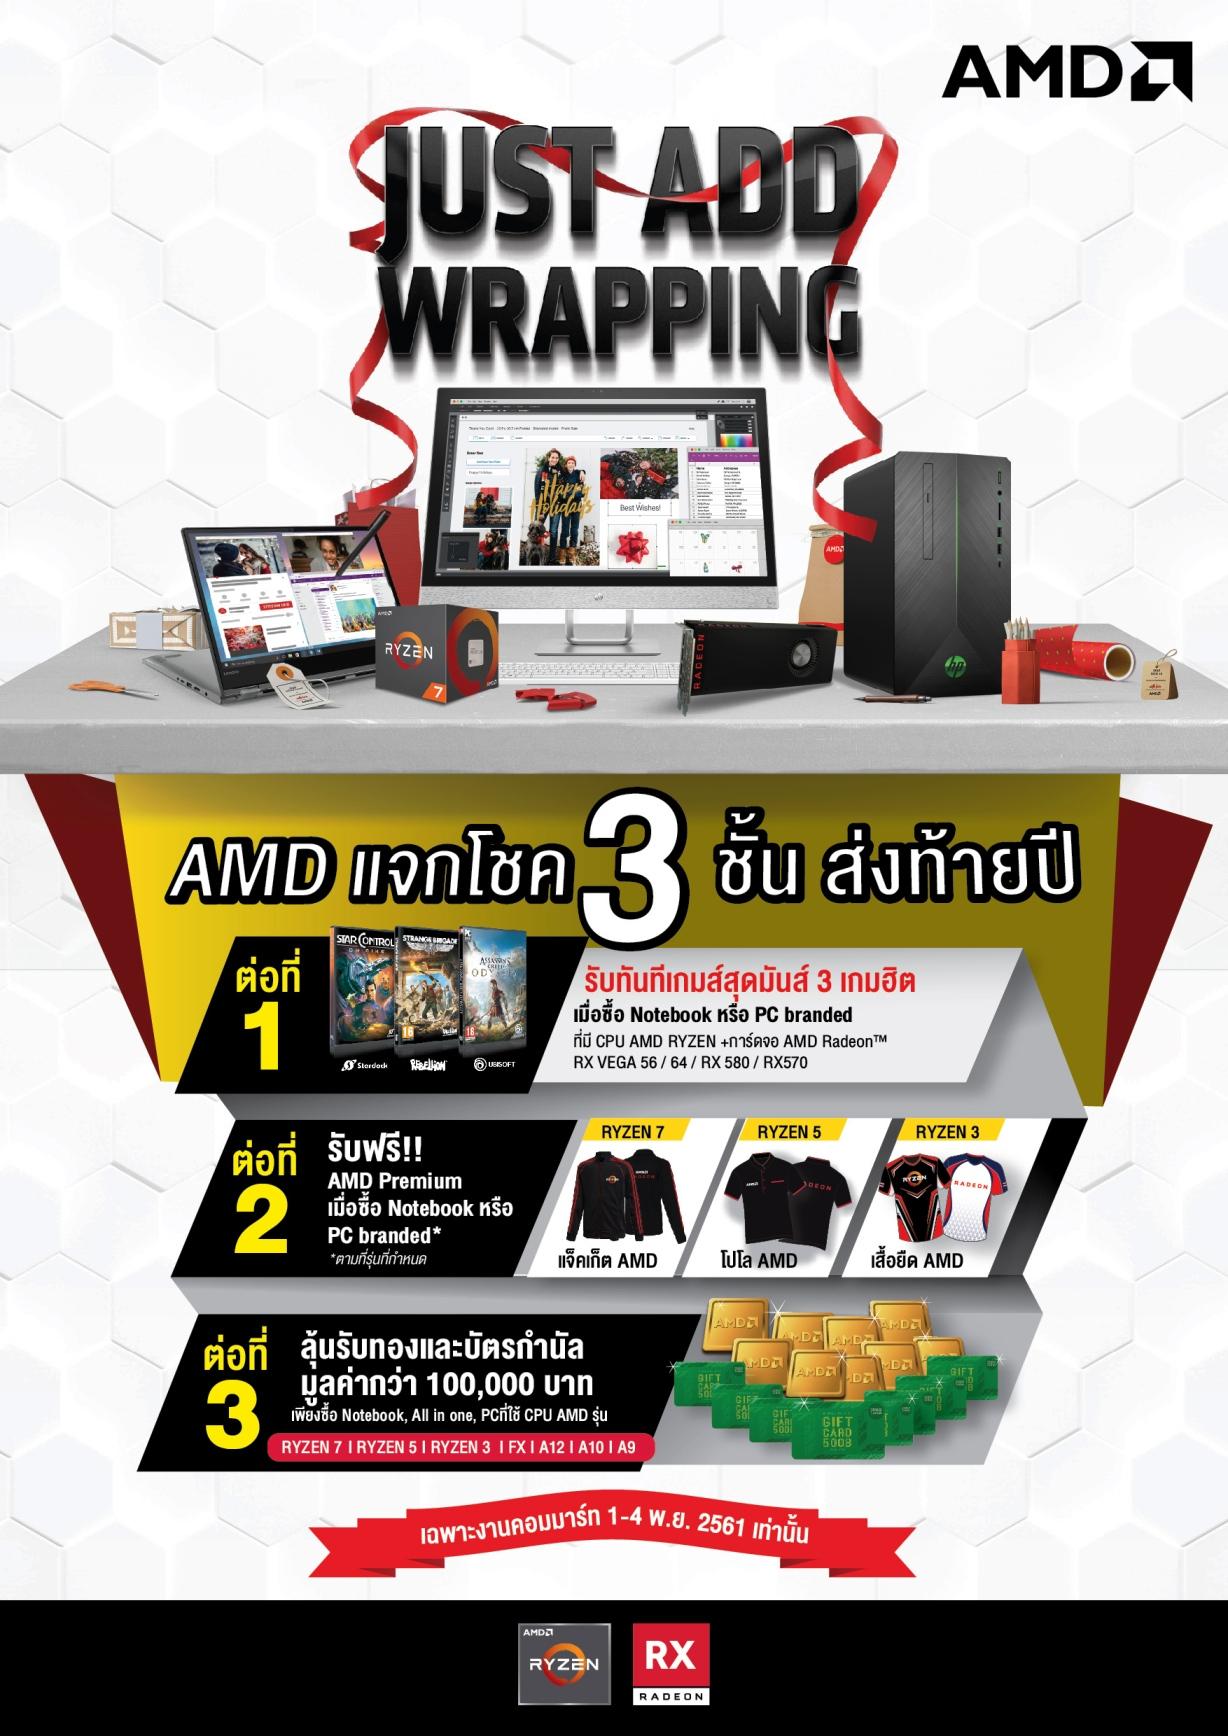 lo3 amd nb commart nov leaflet a5 f AMD ส่งโปรแรงปิดท้ายปี ลุ้นโชค 3 ชั้น ตั้งแต่วันที่ 1 4 พ.ย. 2561 ที่งานคอมมาร์ทเท่านั้น‼